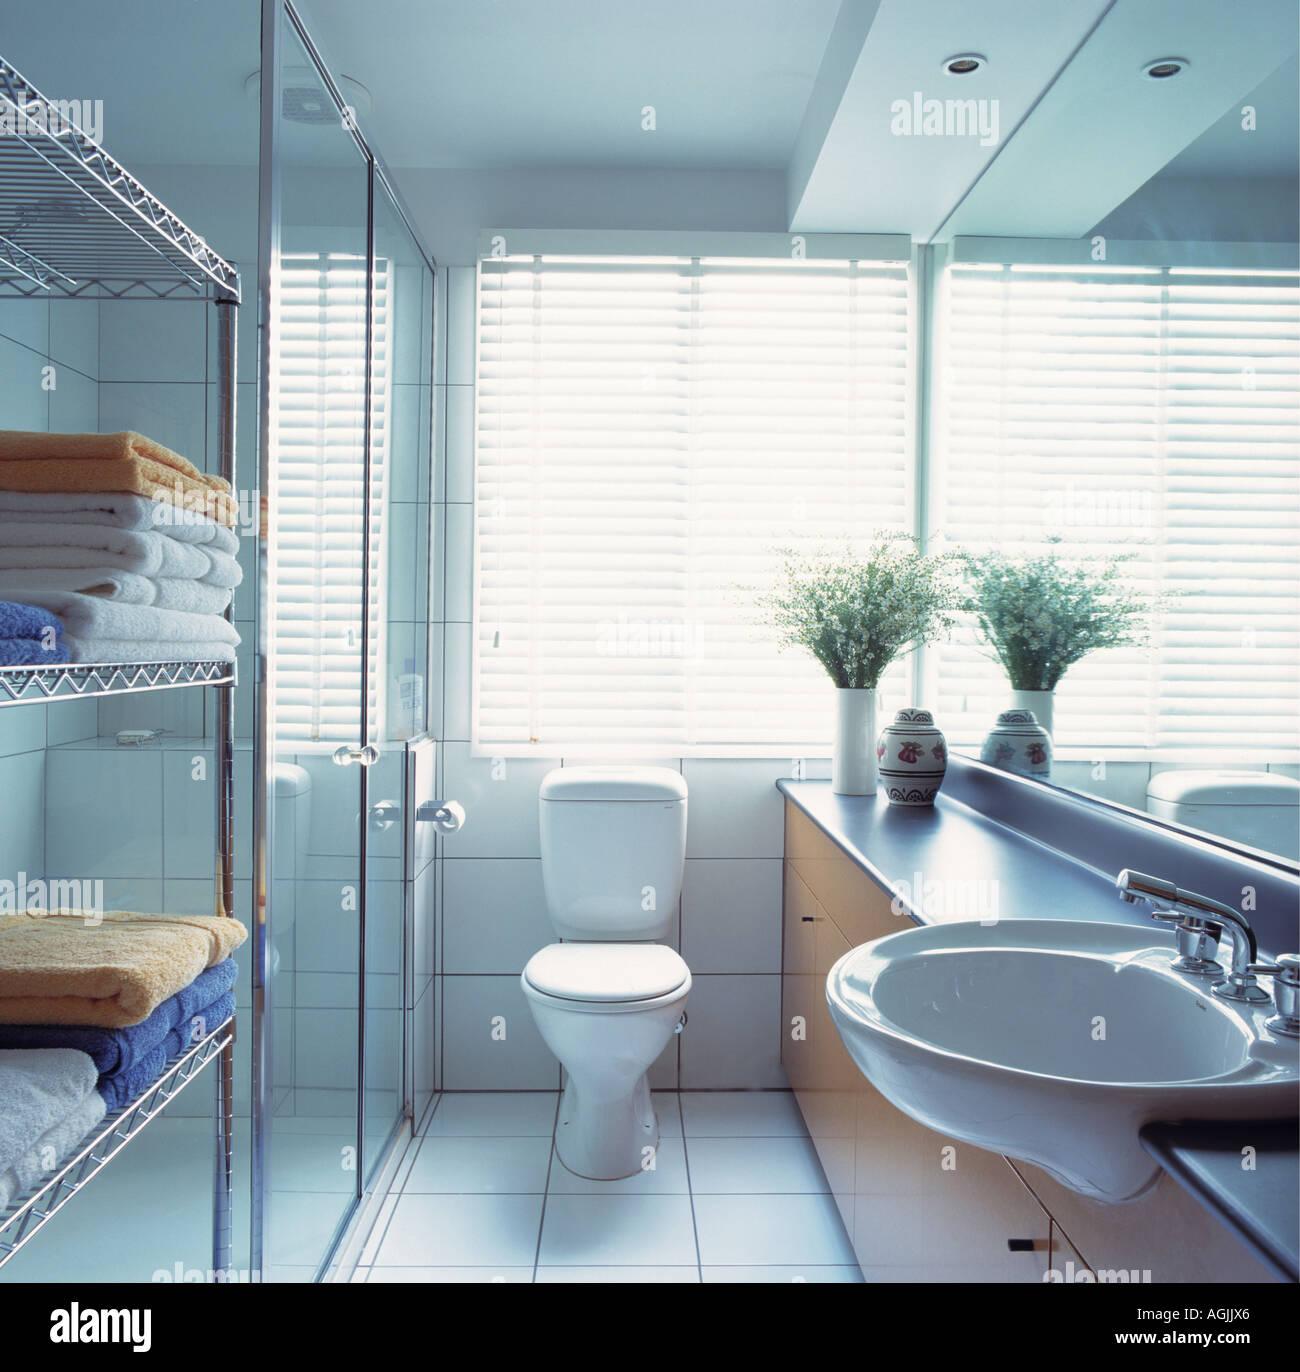 Long Narrow Bathroom Stock Photo: 8128549 - Alamy